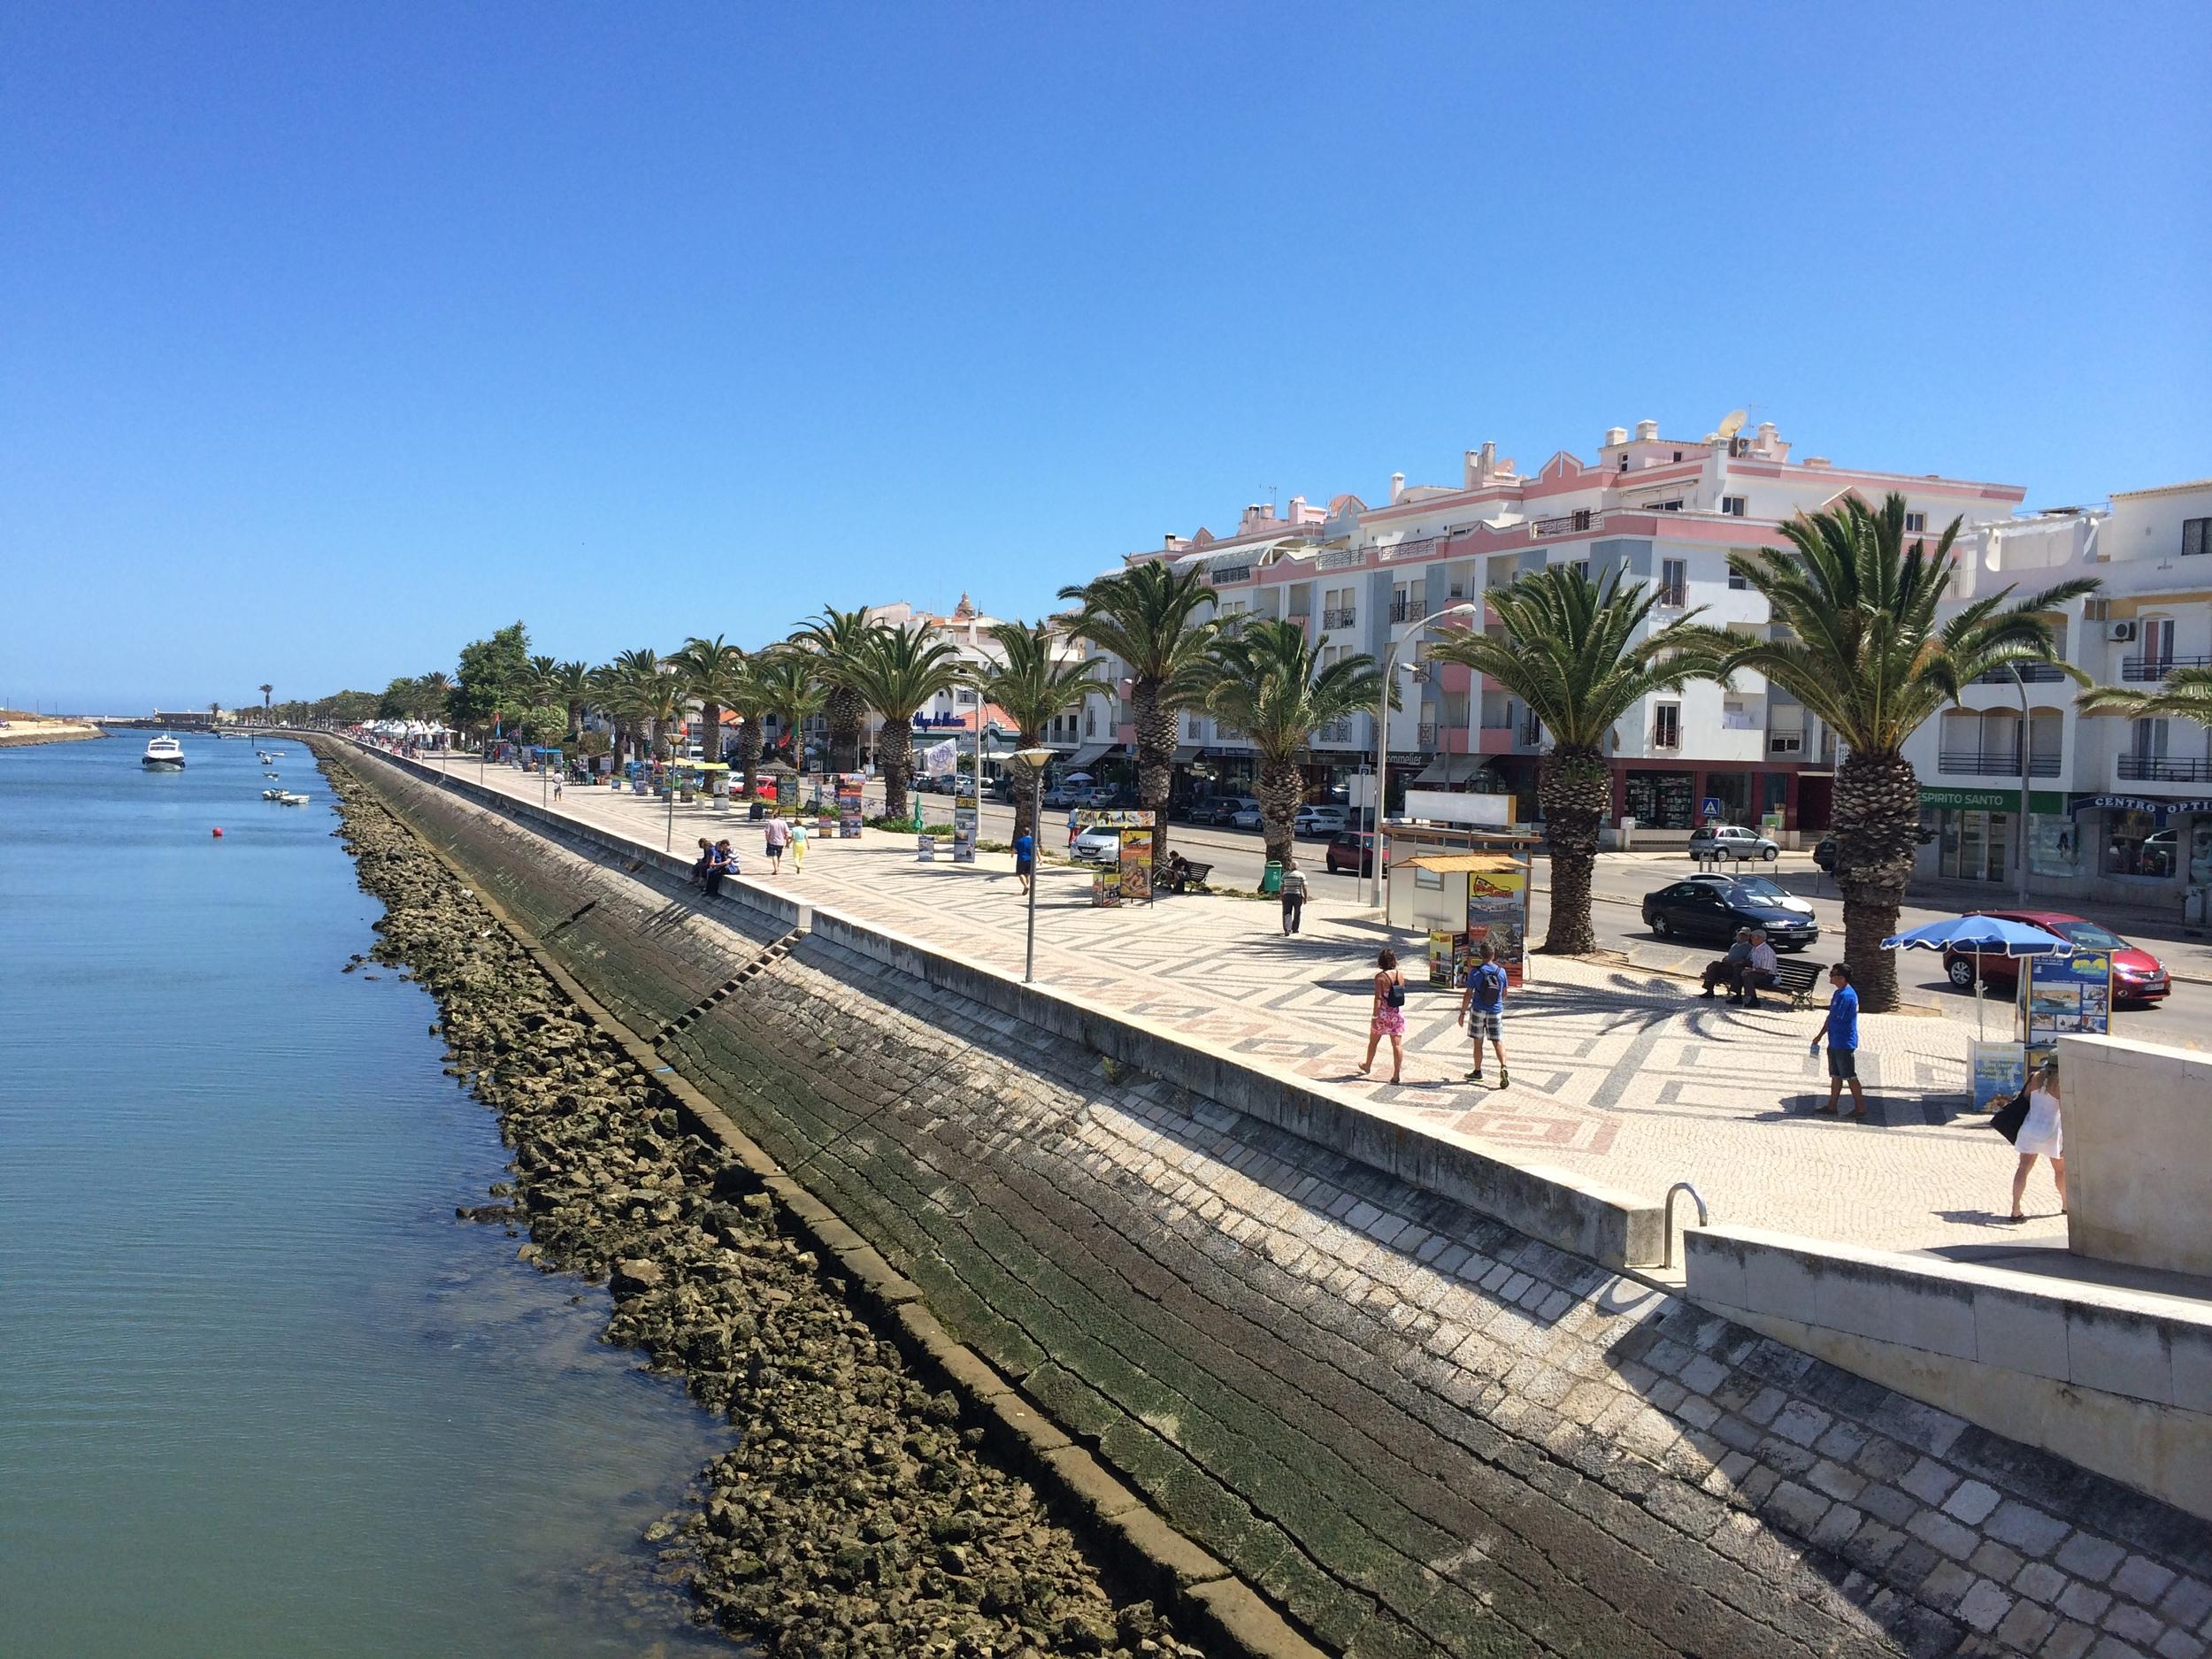 The main walkway along the marina in the city center.